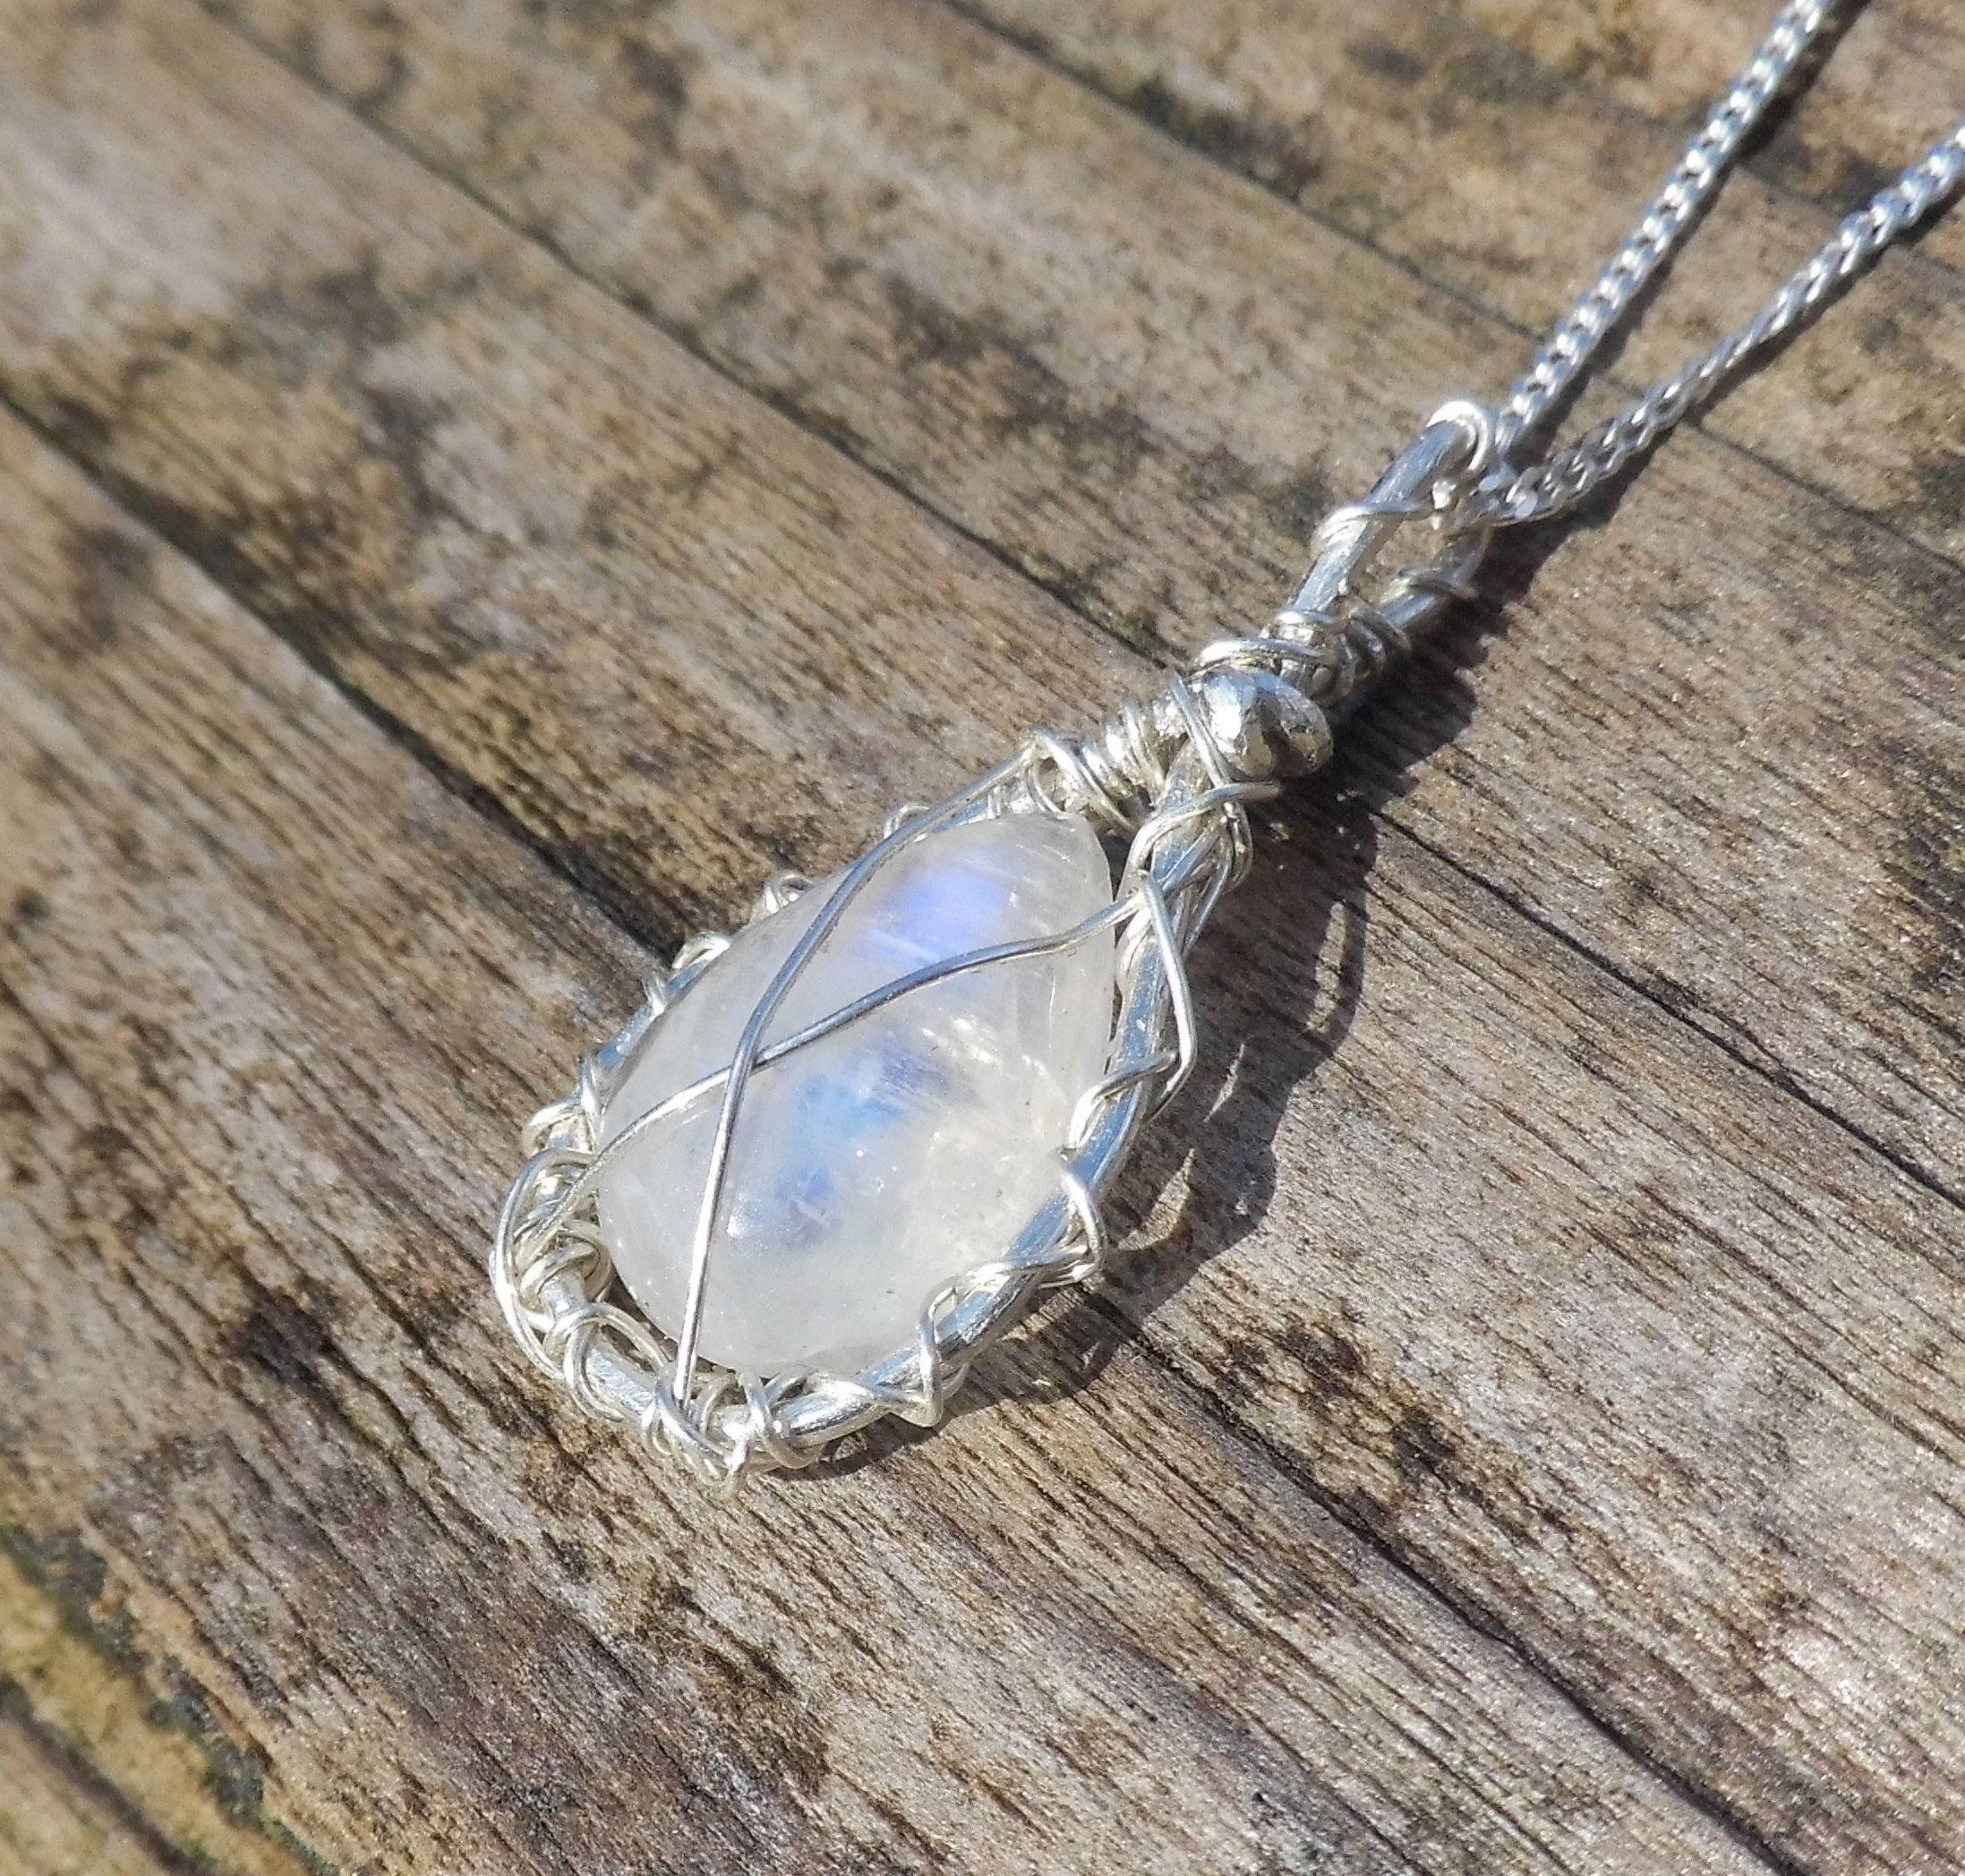 Smoky quartz necklace crystal necklace moonstone necklace healing crystals choker boho jewlery bohemian necklace